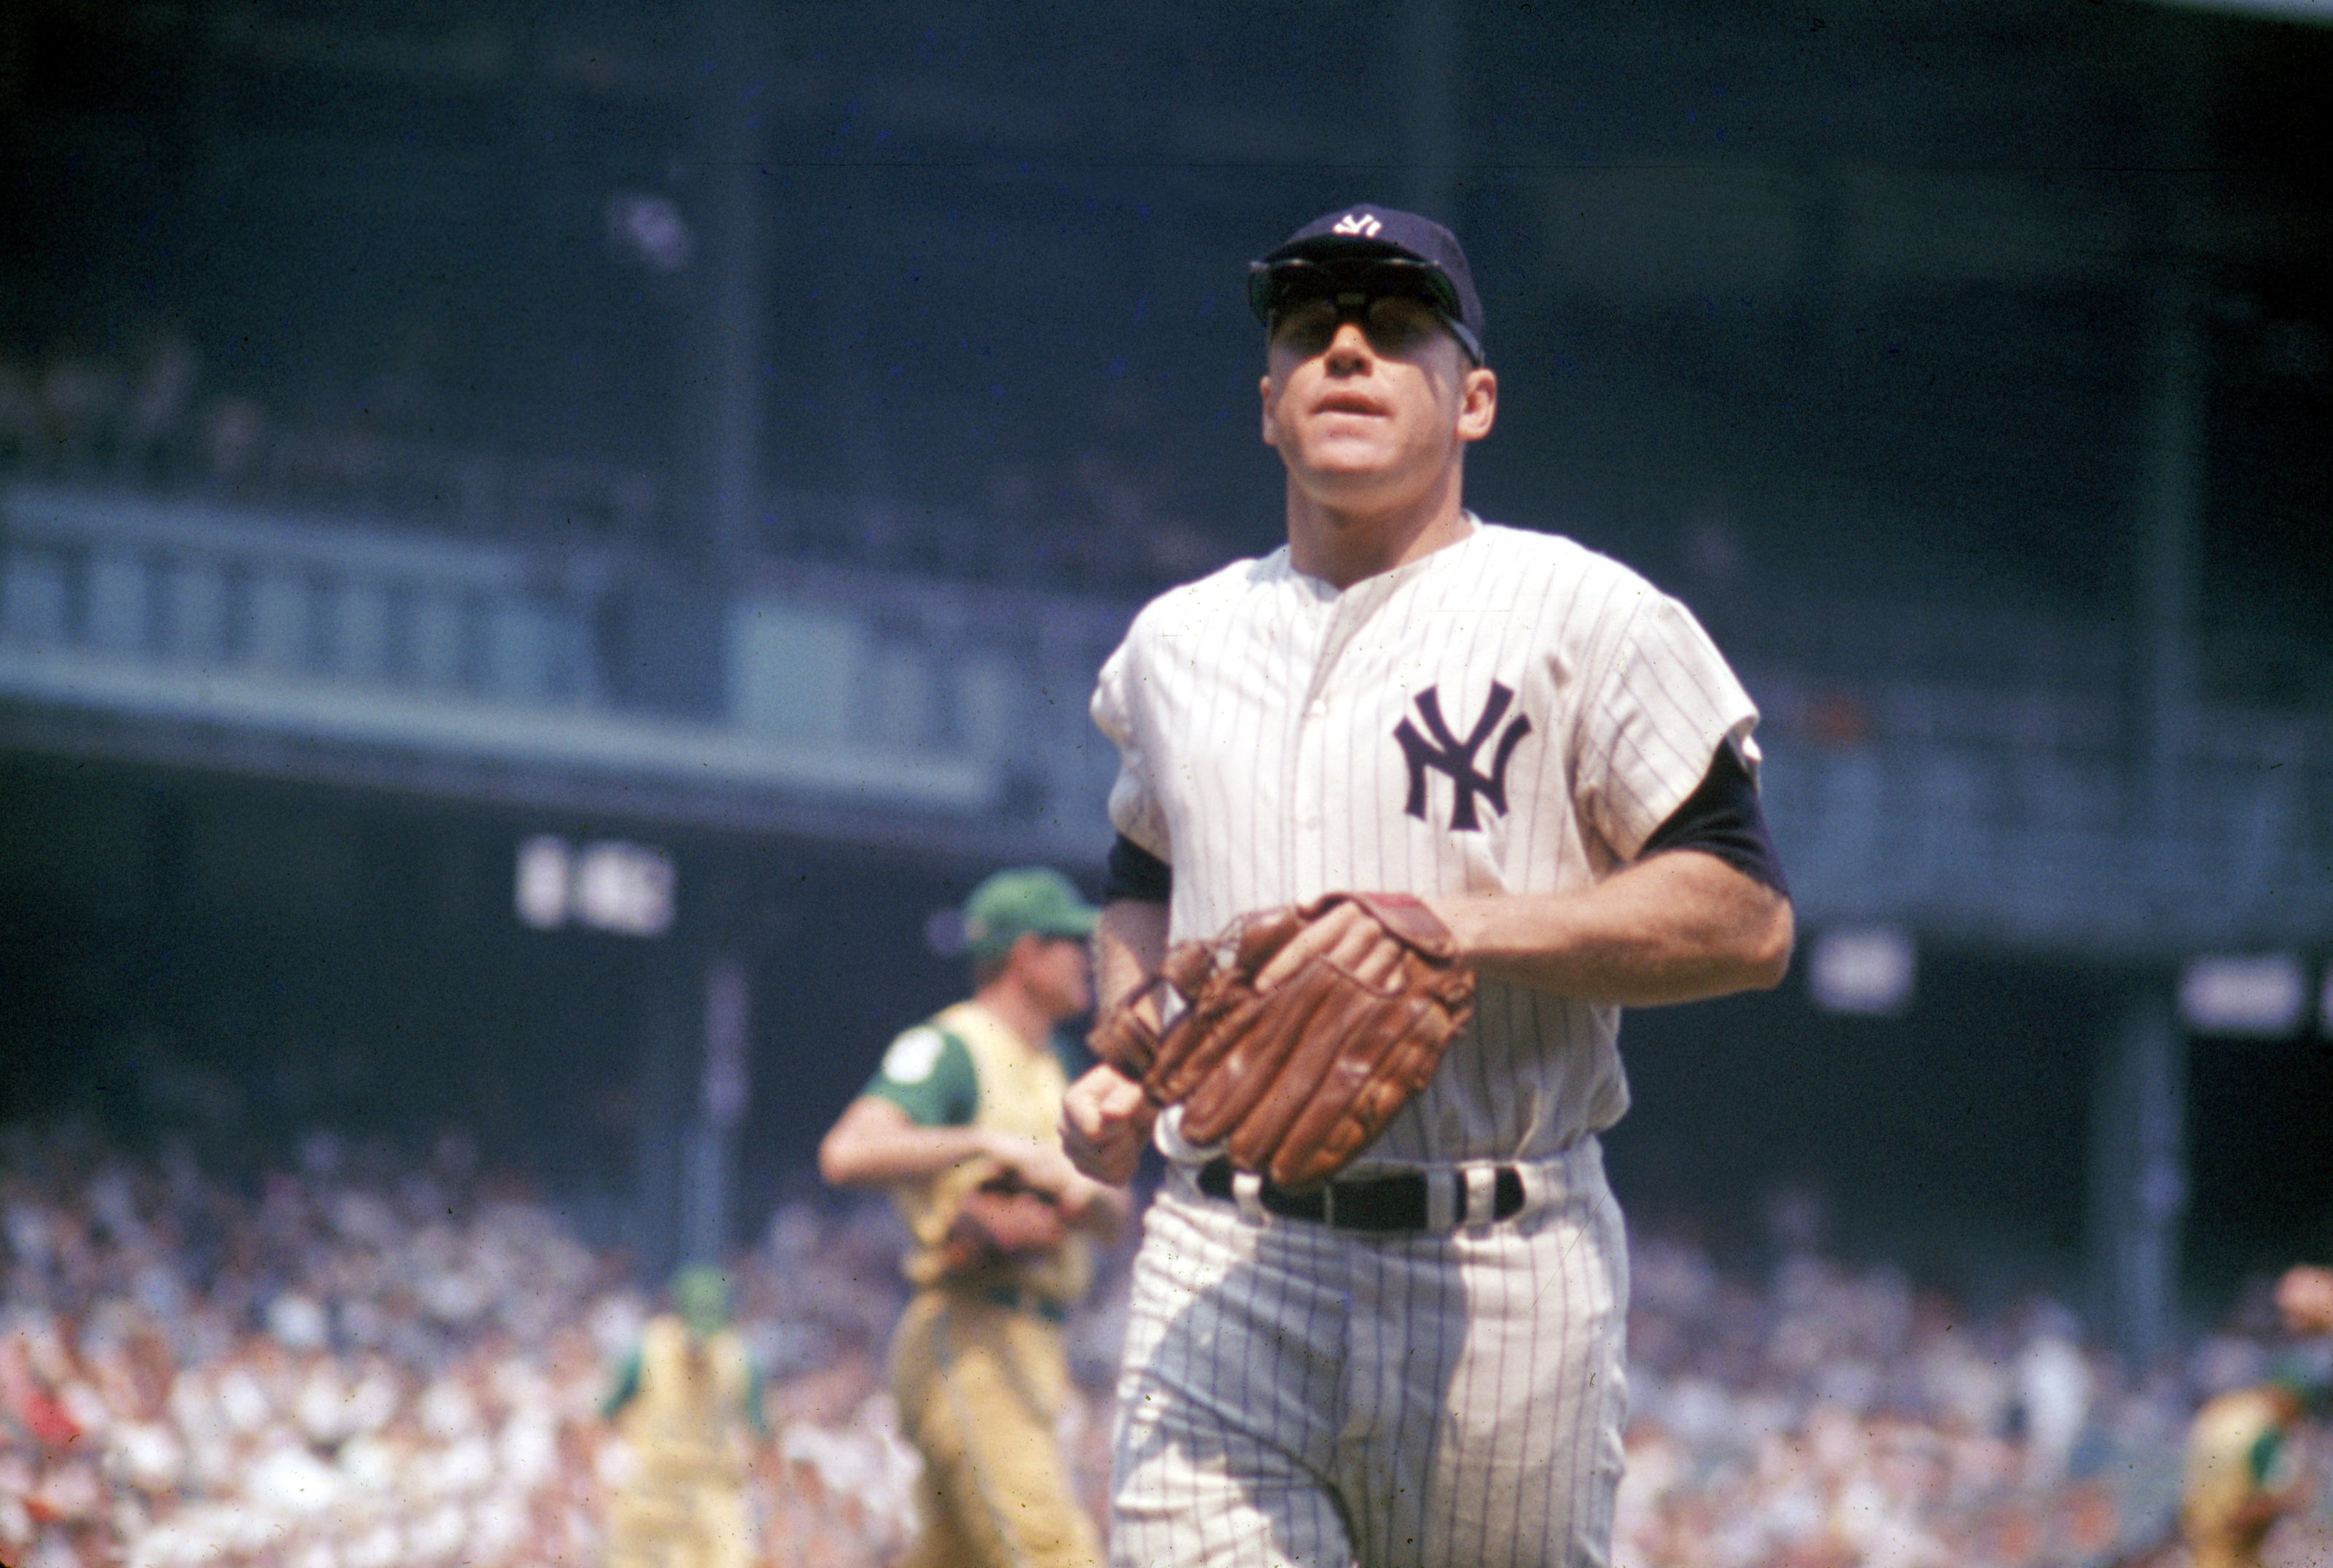 New York Yankees: Mickey Mantle plays his last game at Yankee Stadium